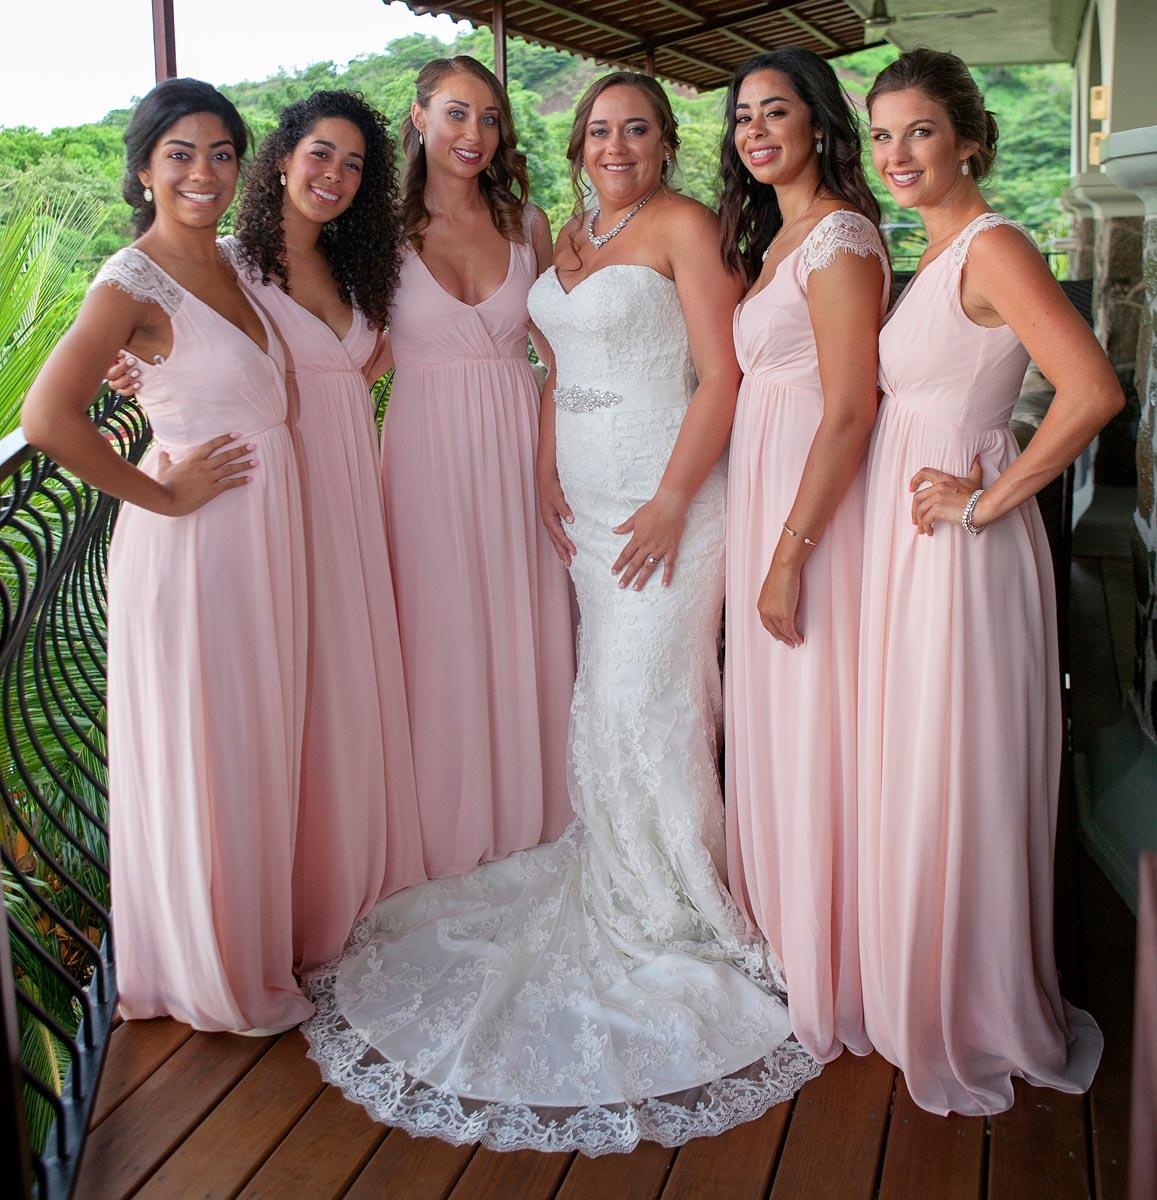 Alanna Martin Surprise It S Your Wedding Day: Barefoot Vacation Villas